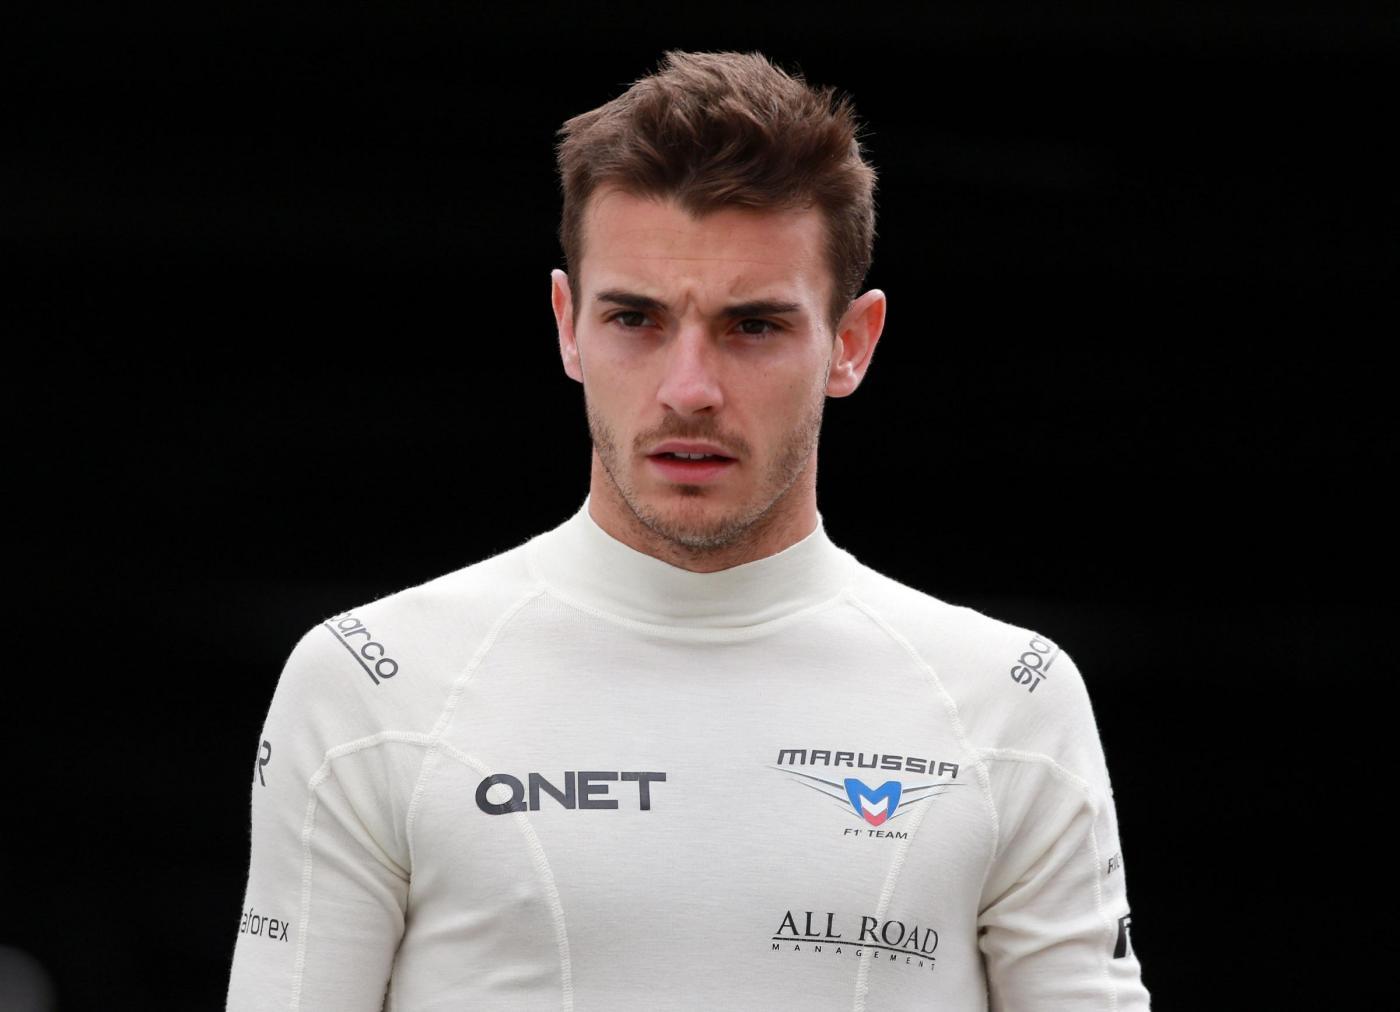 Motor Racing Jules Bianchi Filer